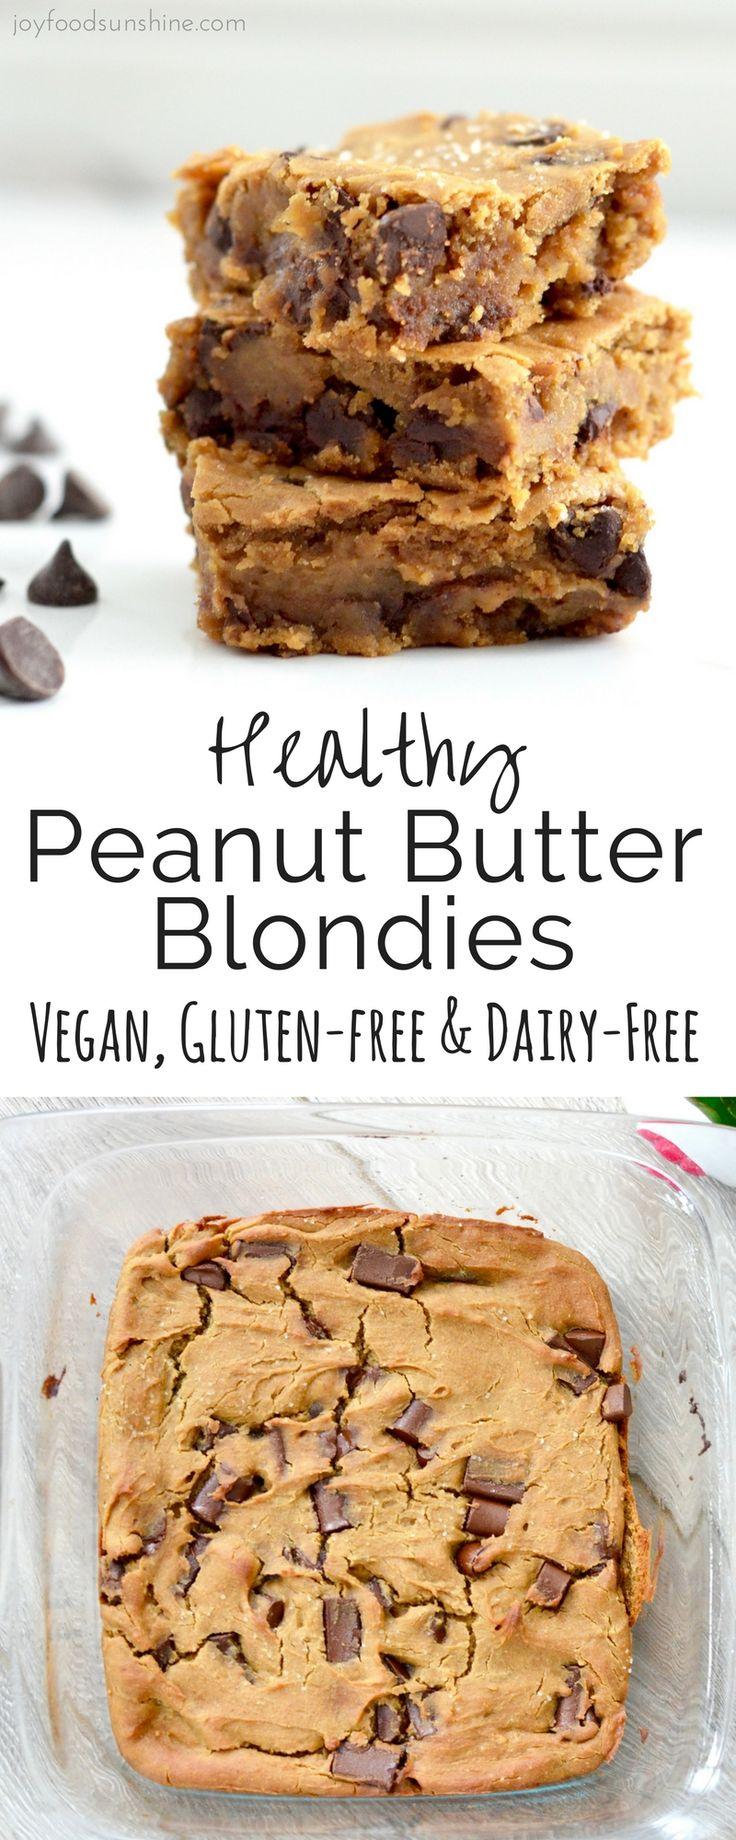 Healthy Peanut Butter Blondies Recipe